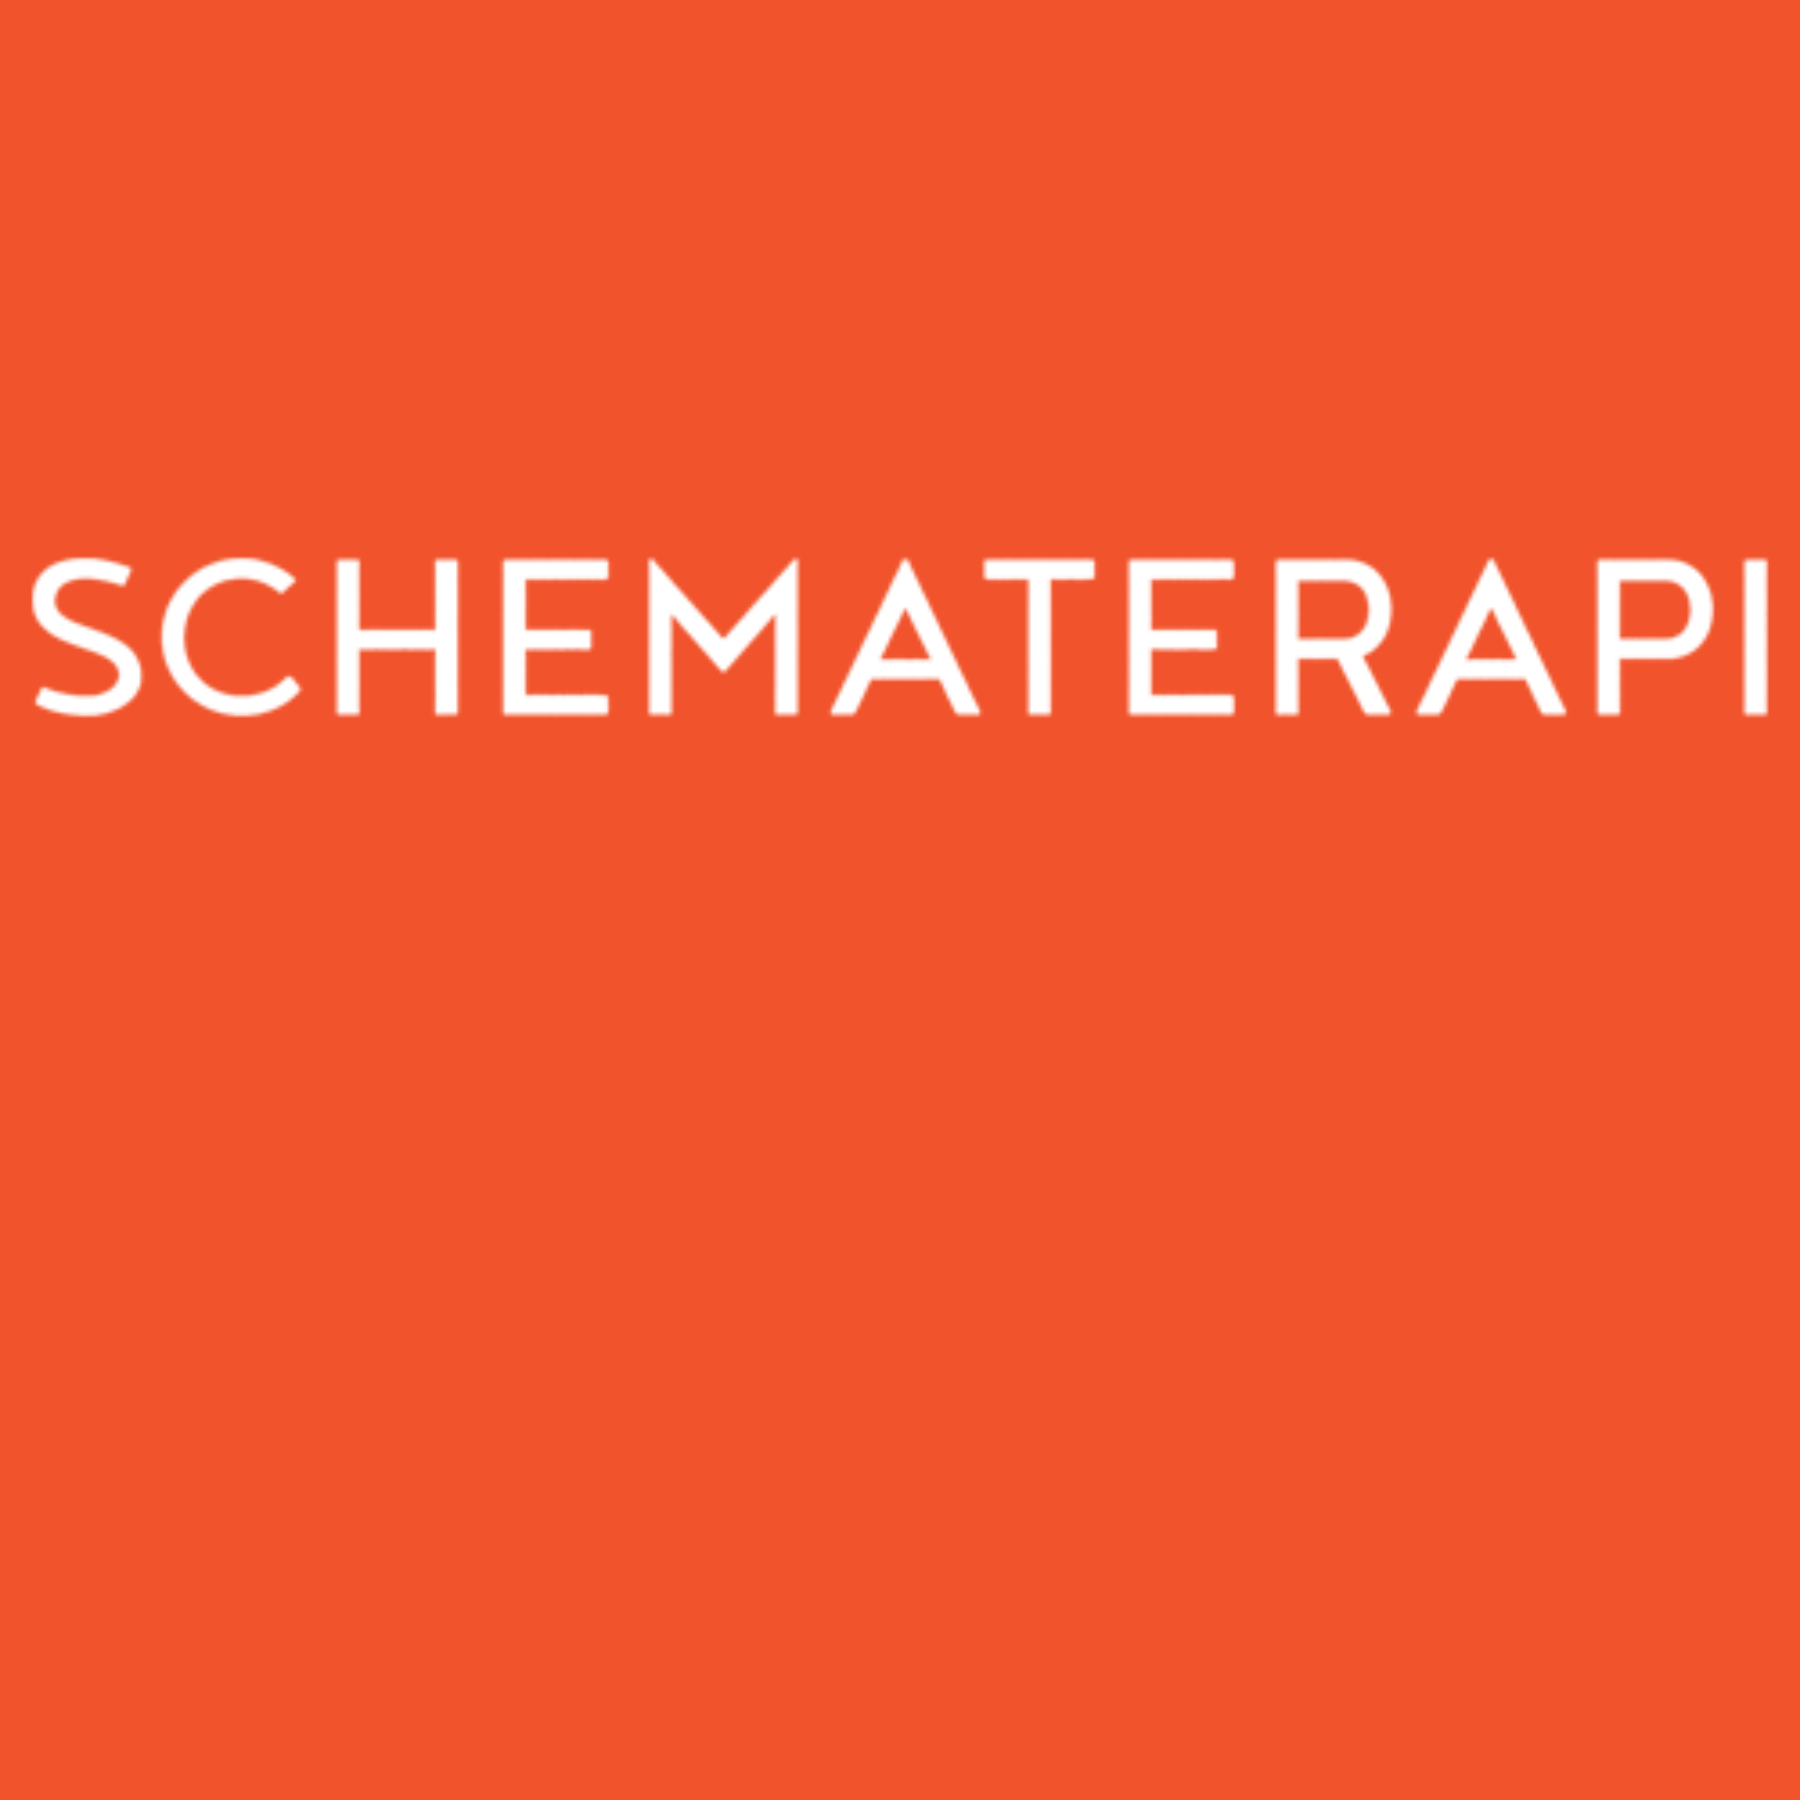 Schematerapi